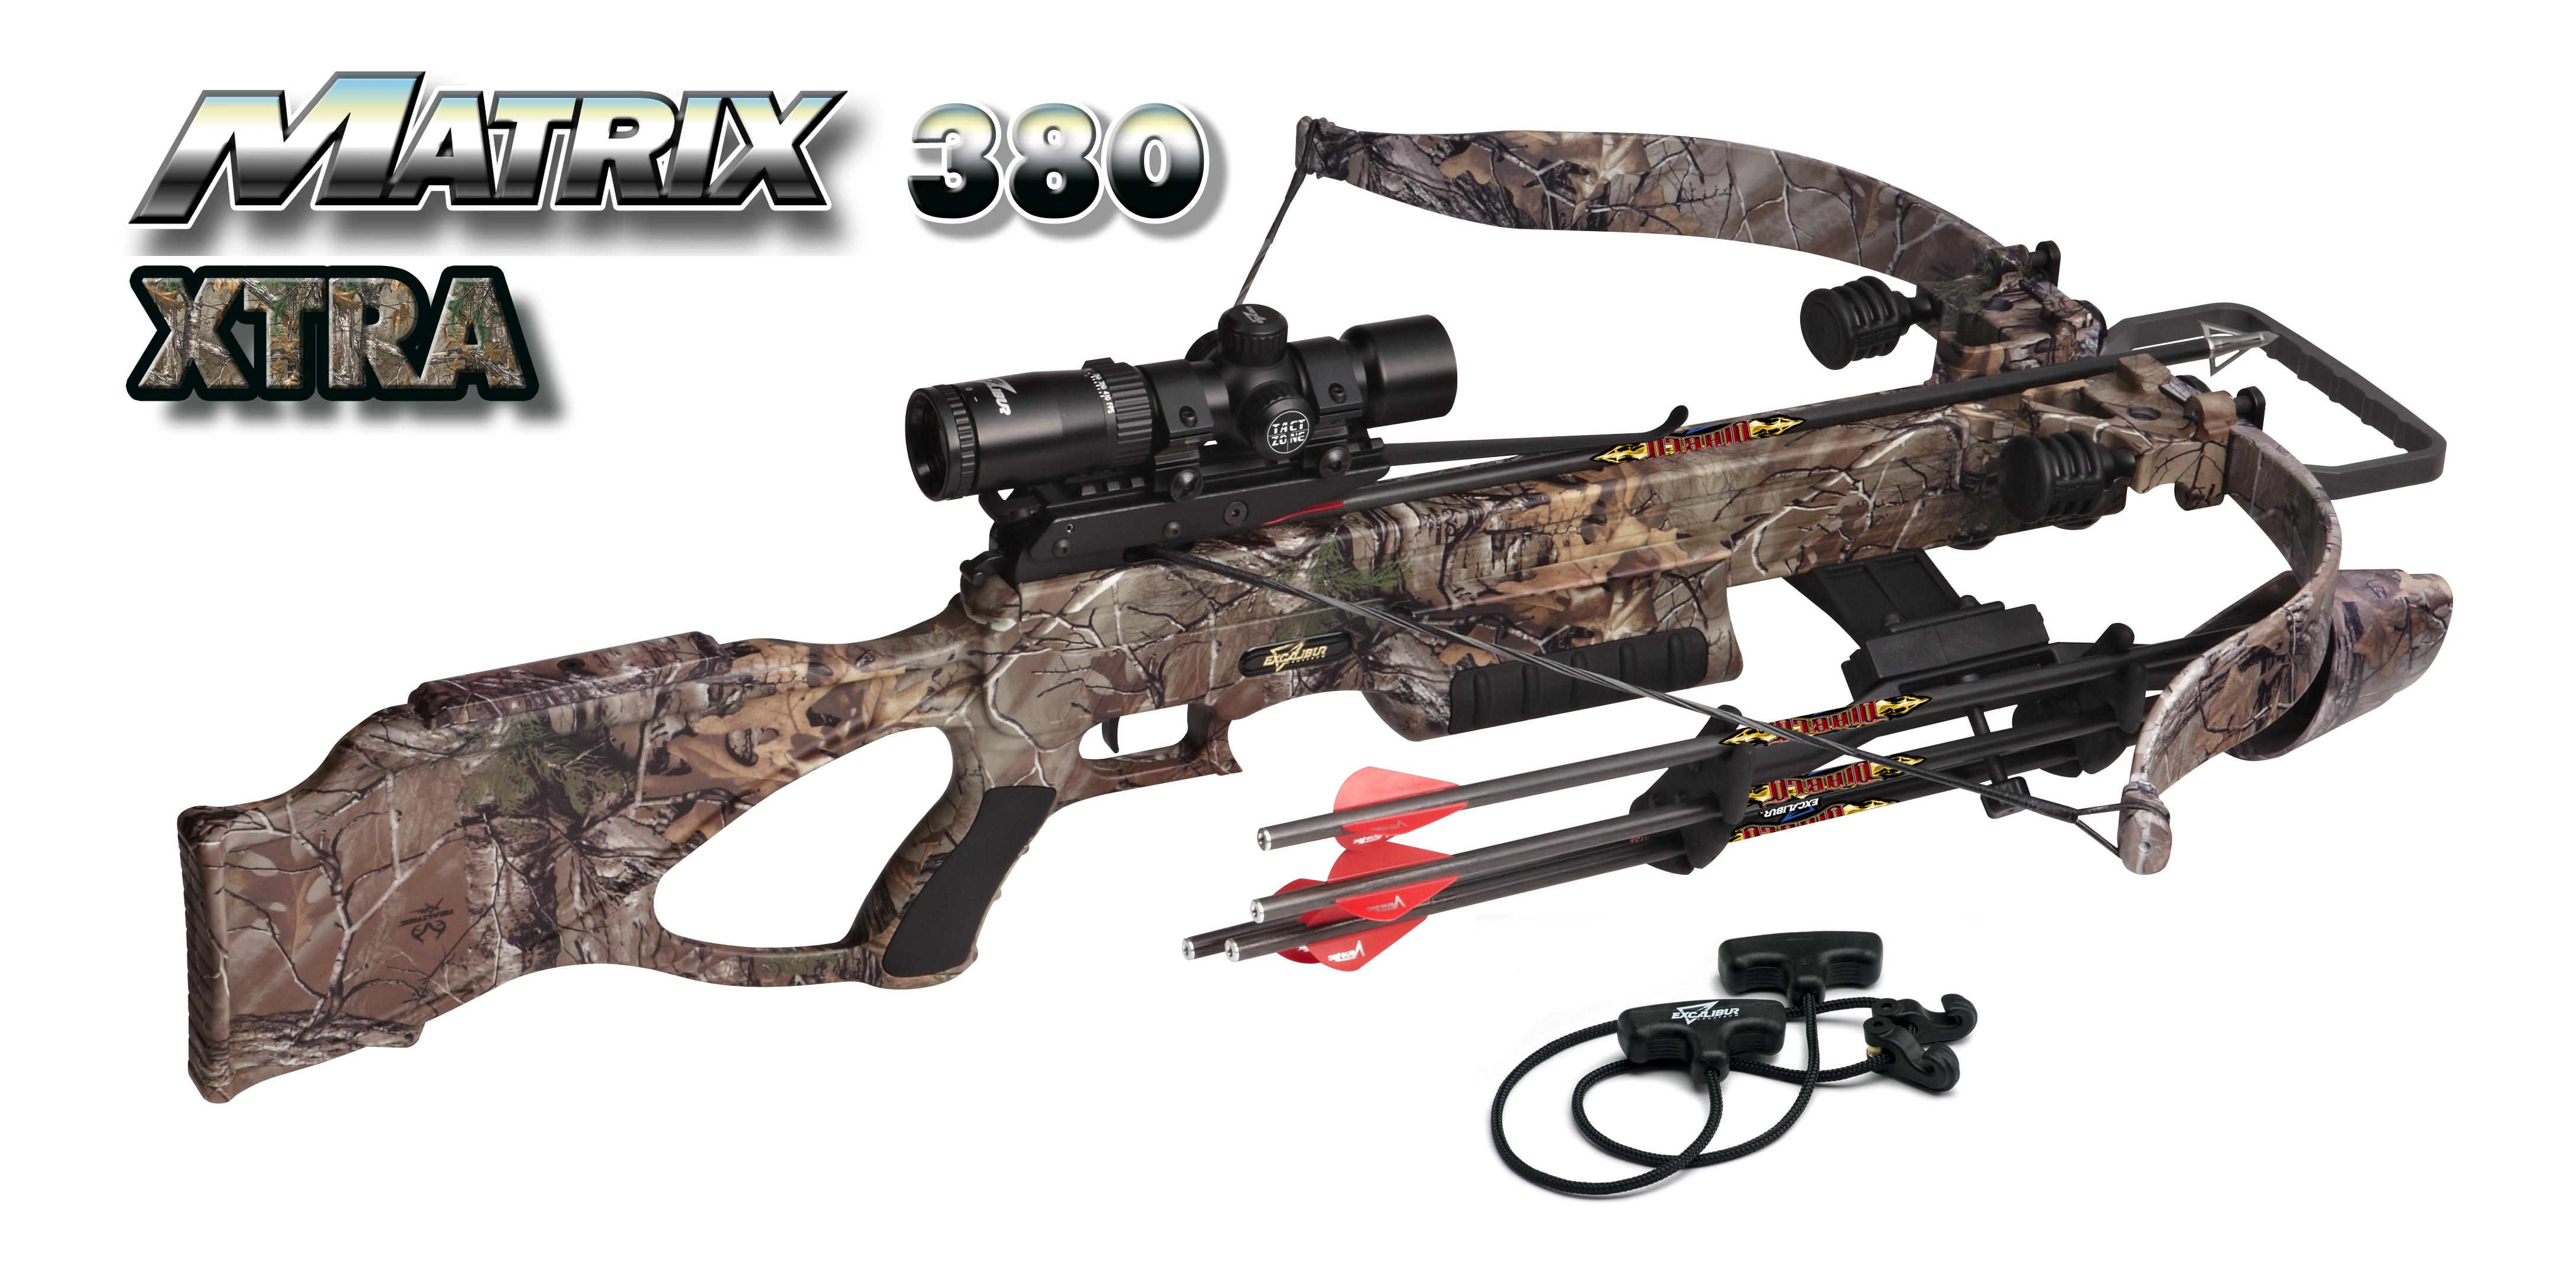 Excalibur Matrix 380 Crossbow Review Best Crossbow Source